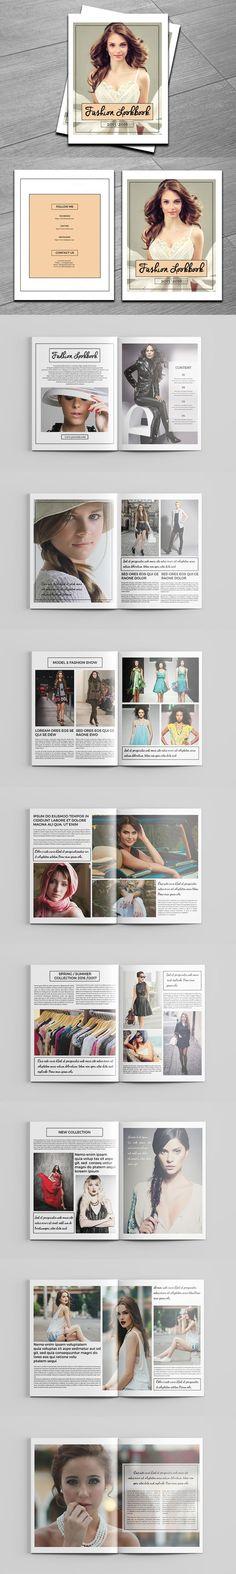 Fashion A4 Trifold Brochure Template #design Download   - fashion design brochure template